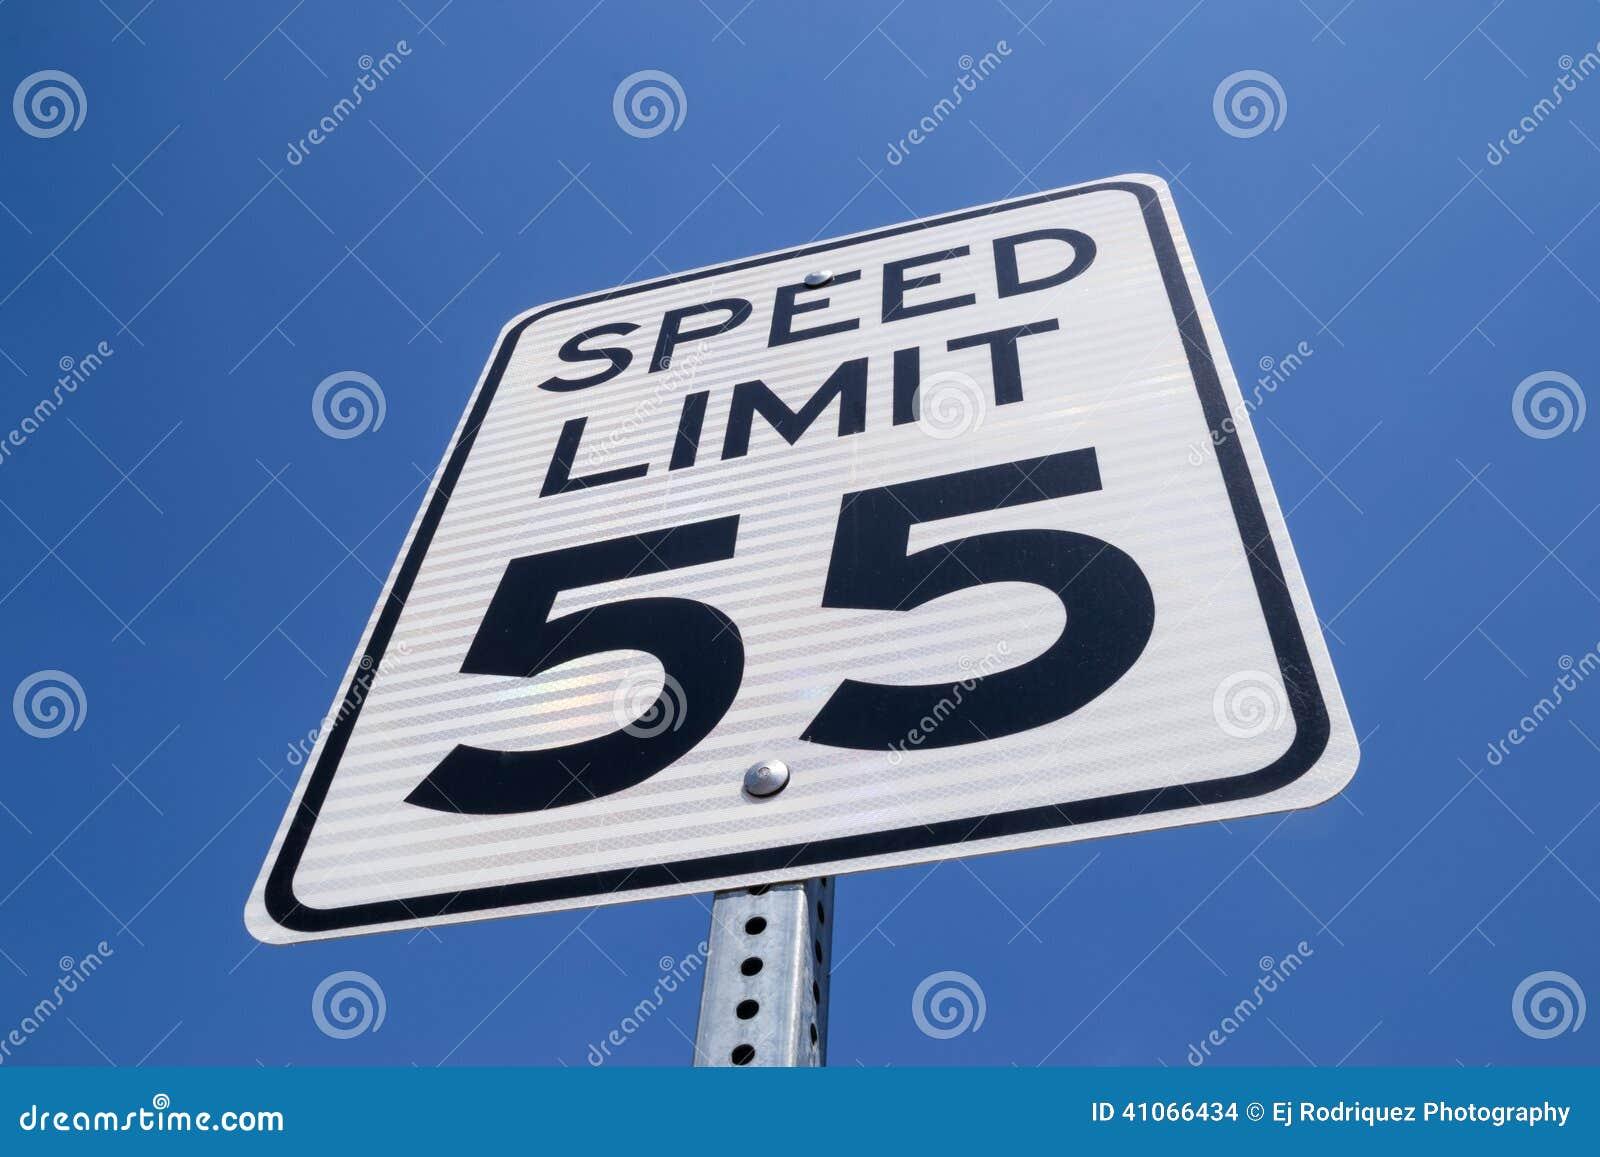 55 mile per hour sign.